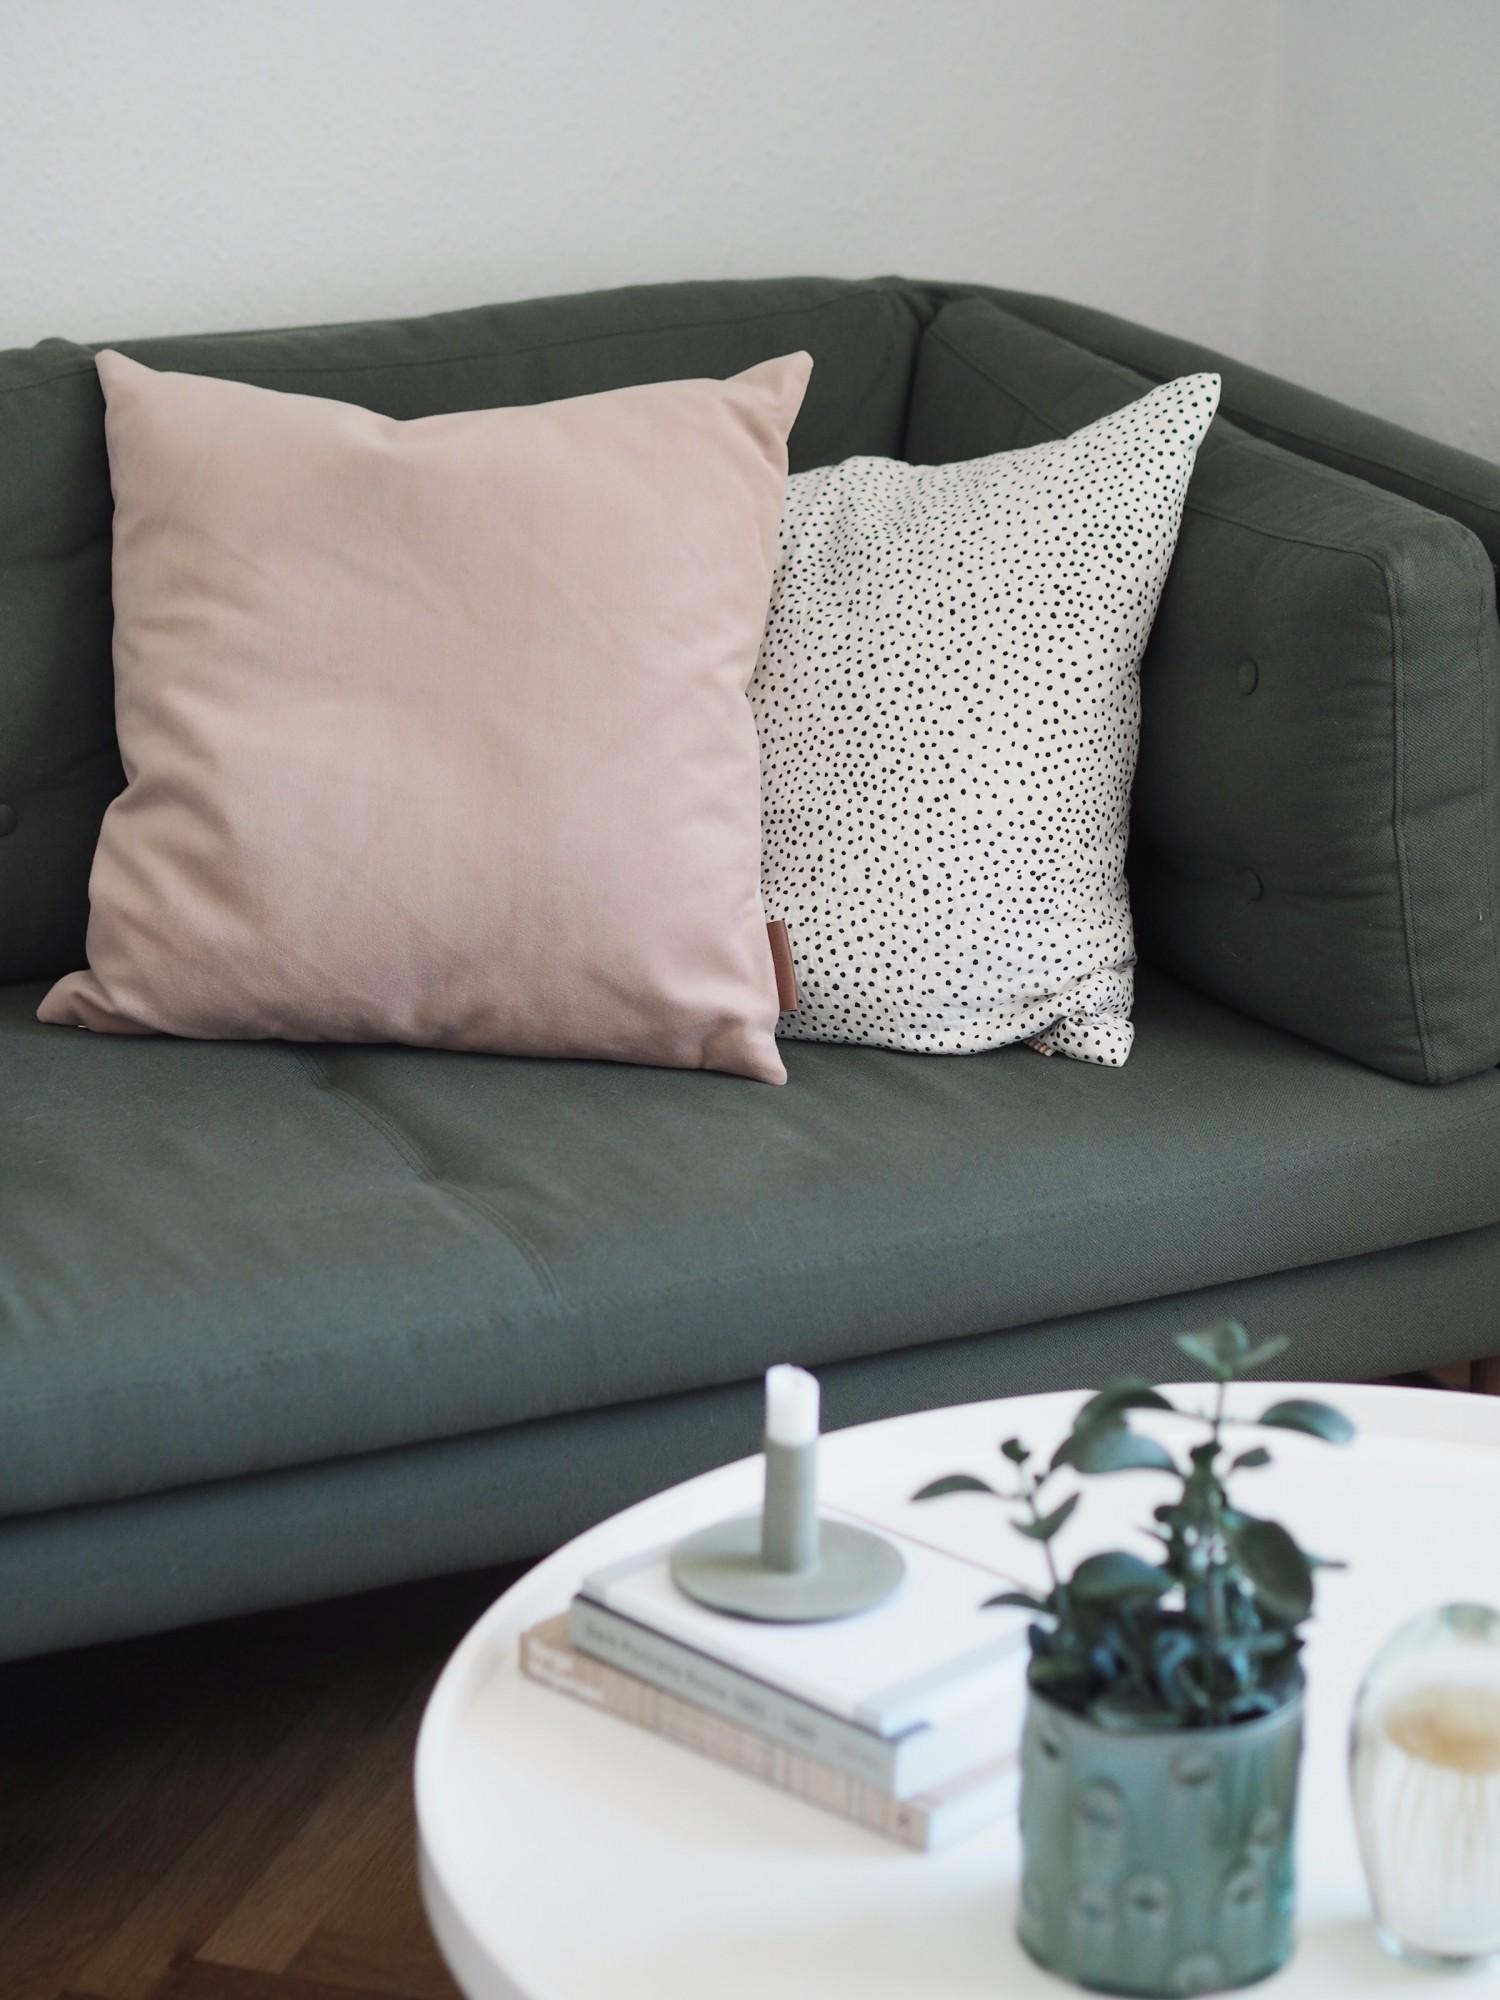 sofapude velour